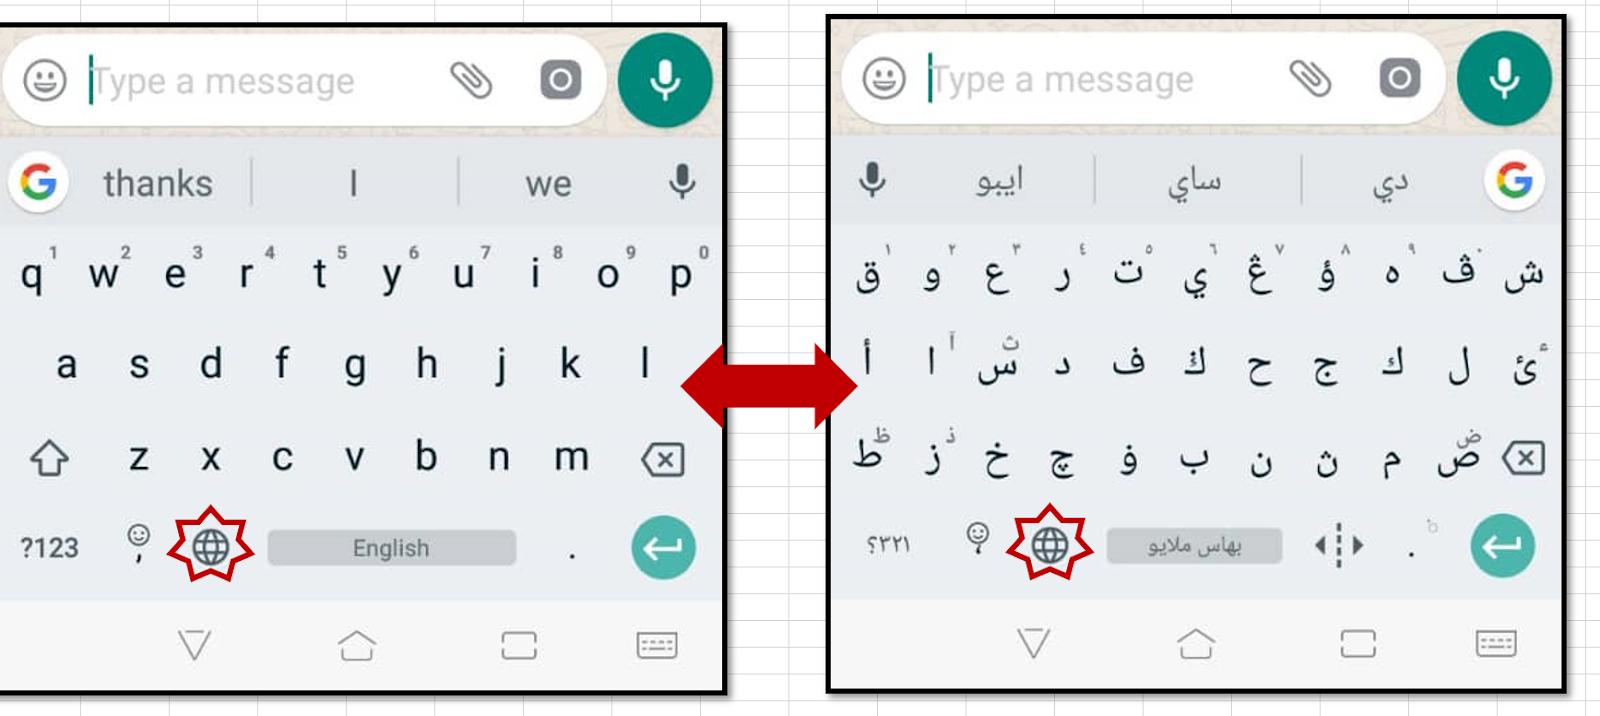 Panduan Setting Tulisan Jawi Di Komputer Windows 10 Telefon Pintar Android